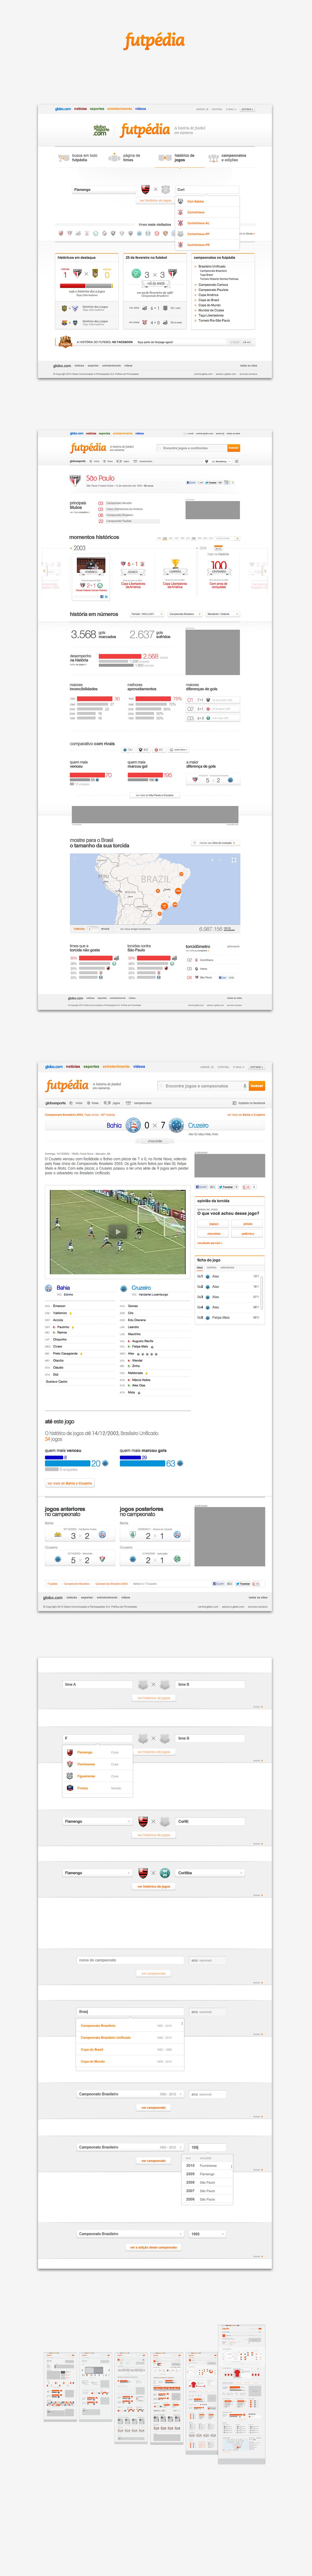 visual design Data infographic data visualization soccer football